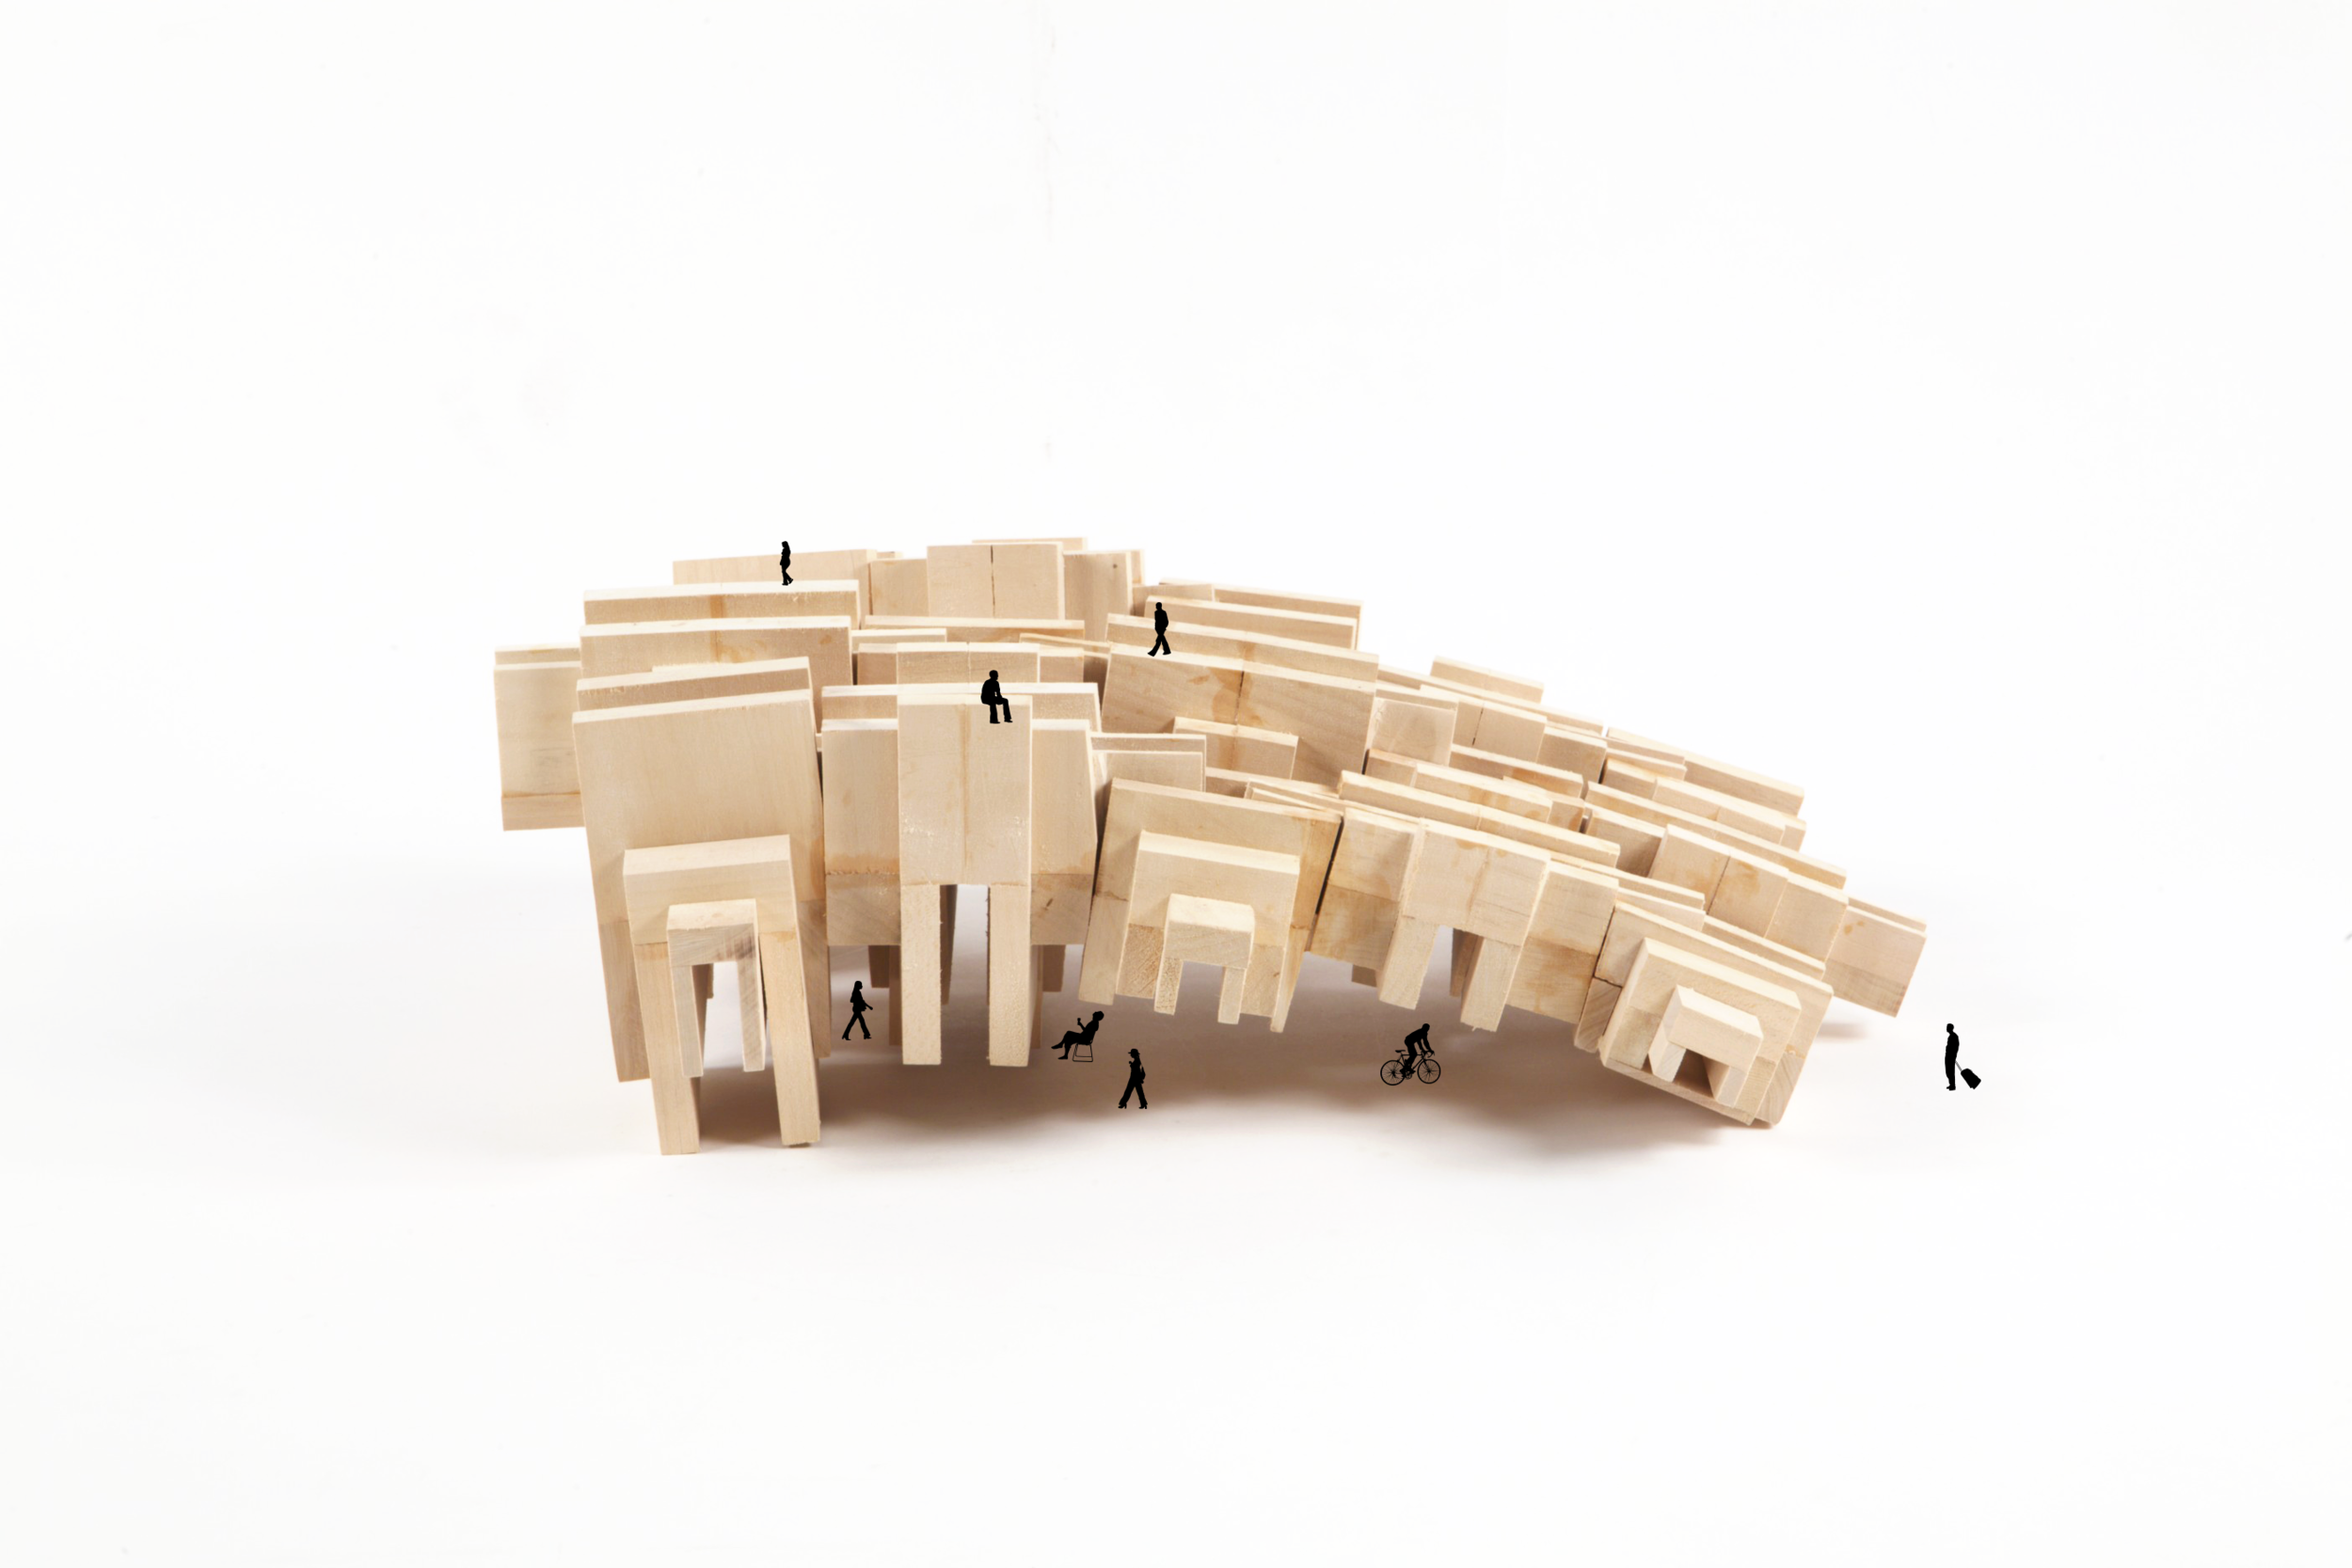 Final Model, a landscape of Uncertainty